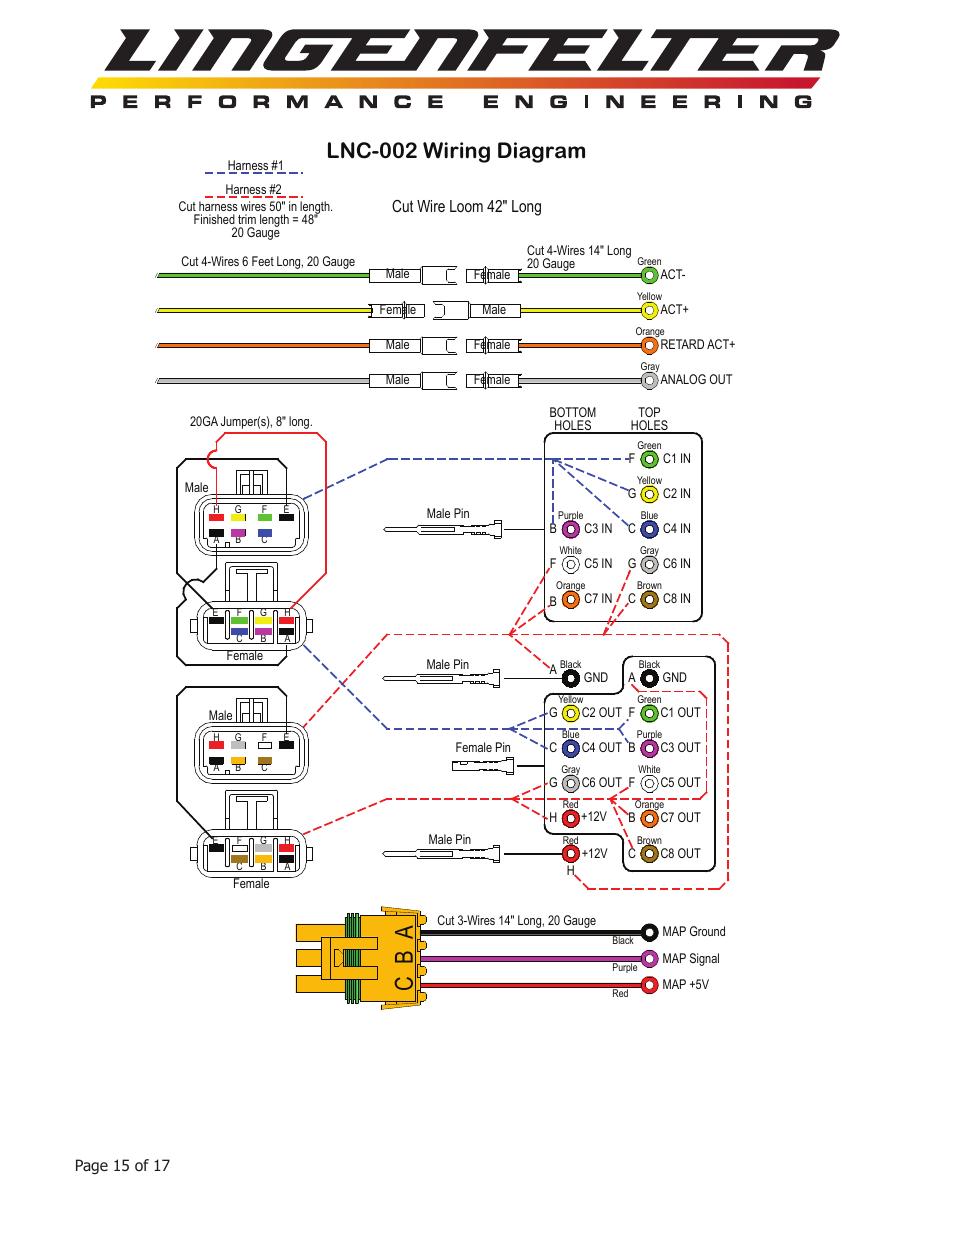 hight resolution of ab c lnc 002 wiring diagram cut wire loom 42 long